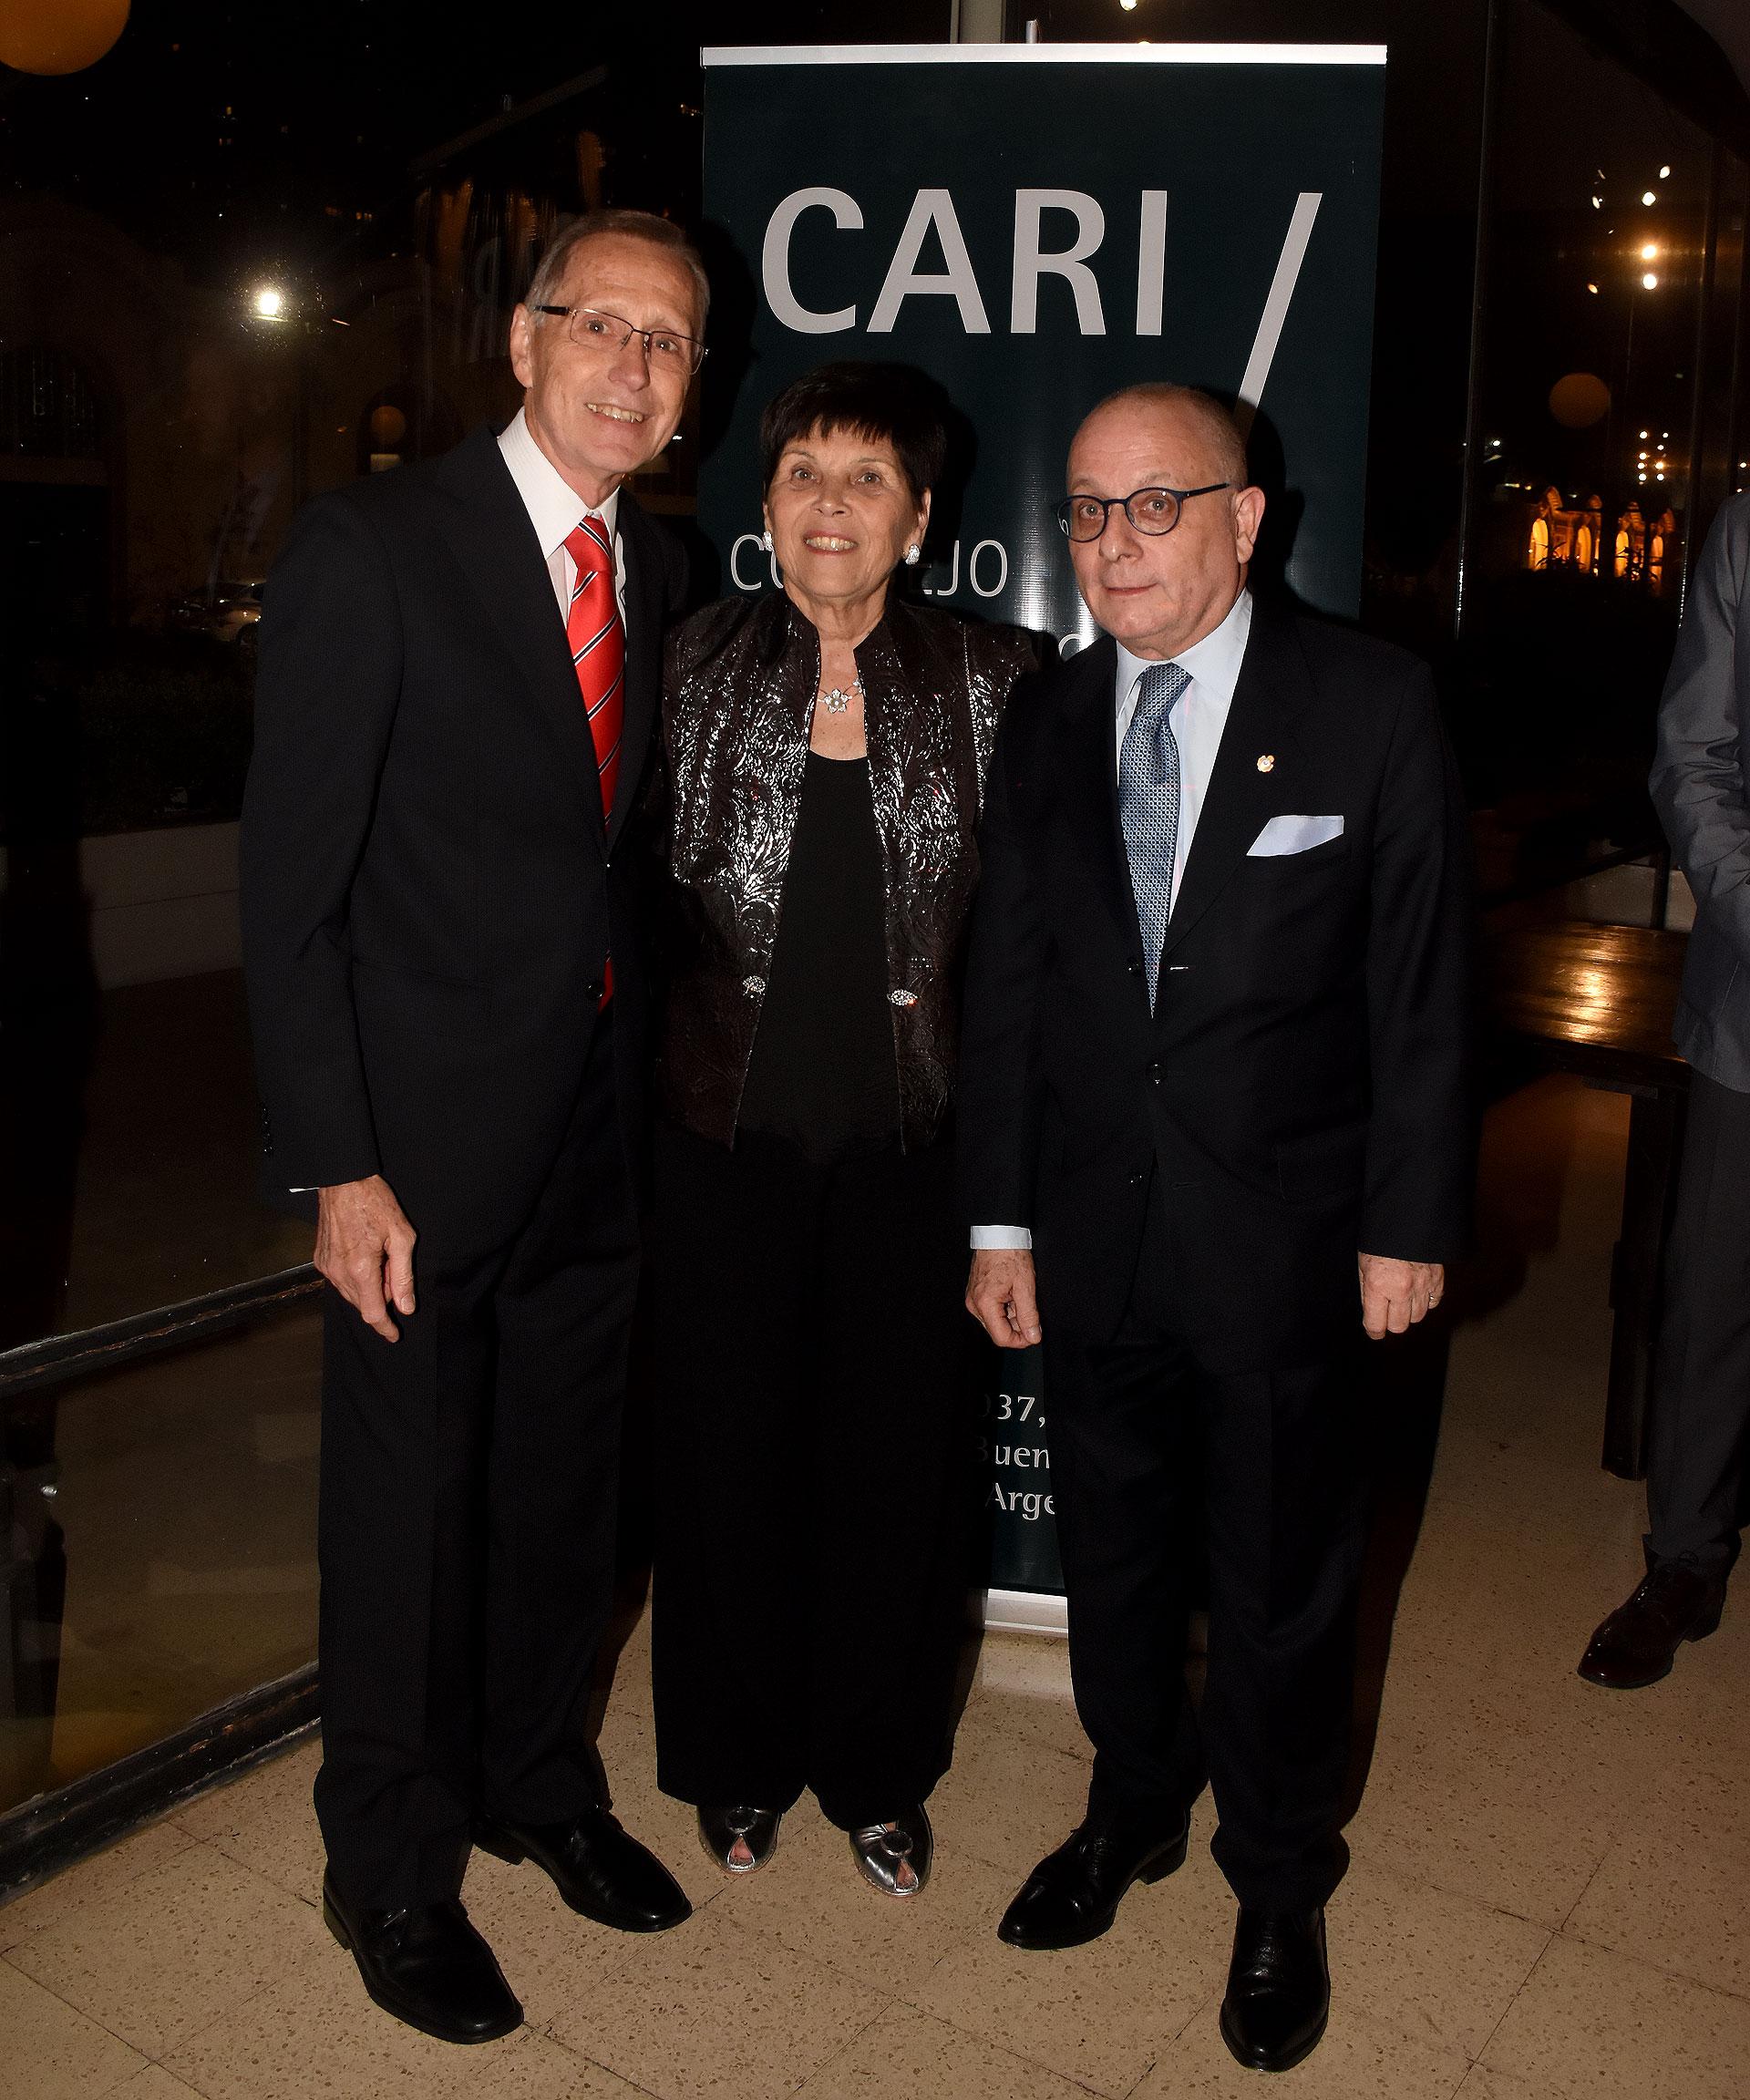 Adalberto Rodríguez Giavarini junto a su mujer Susana Pestana y al canciller Jorge Faurie